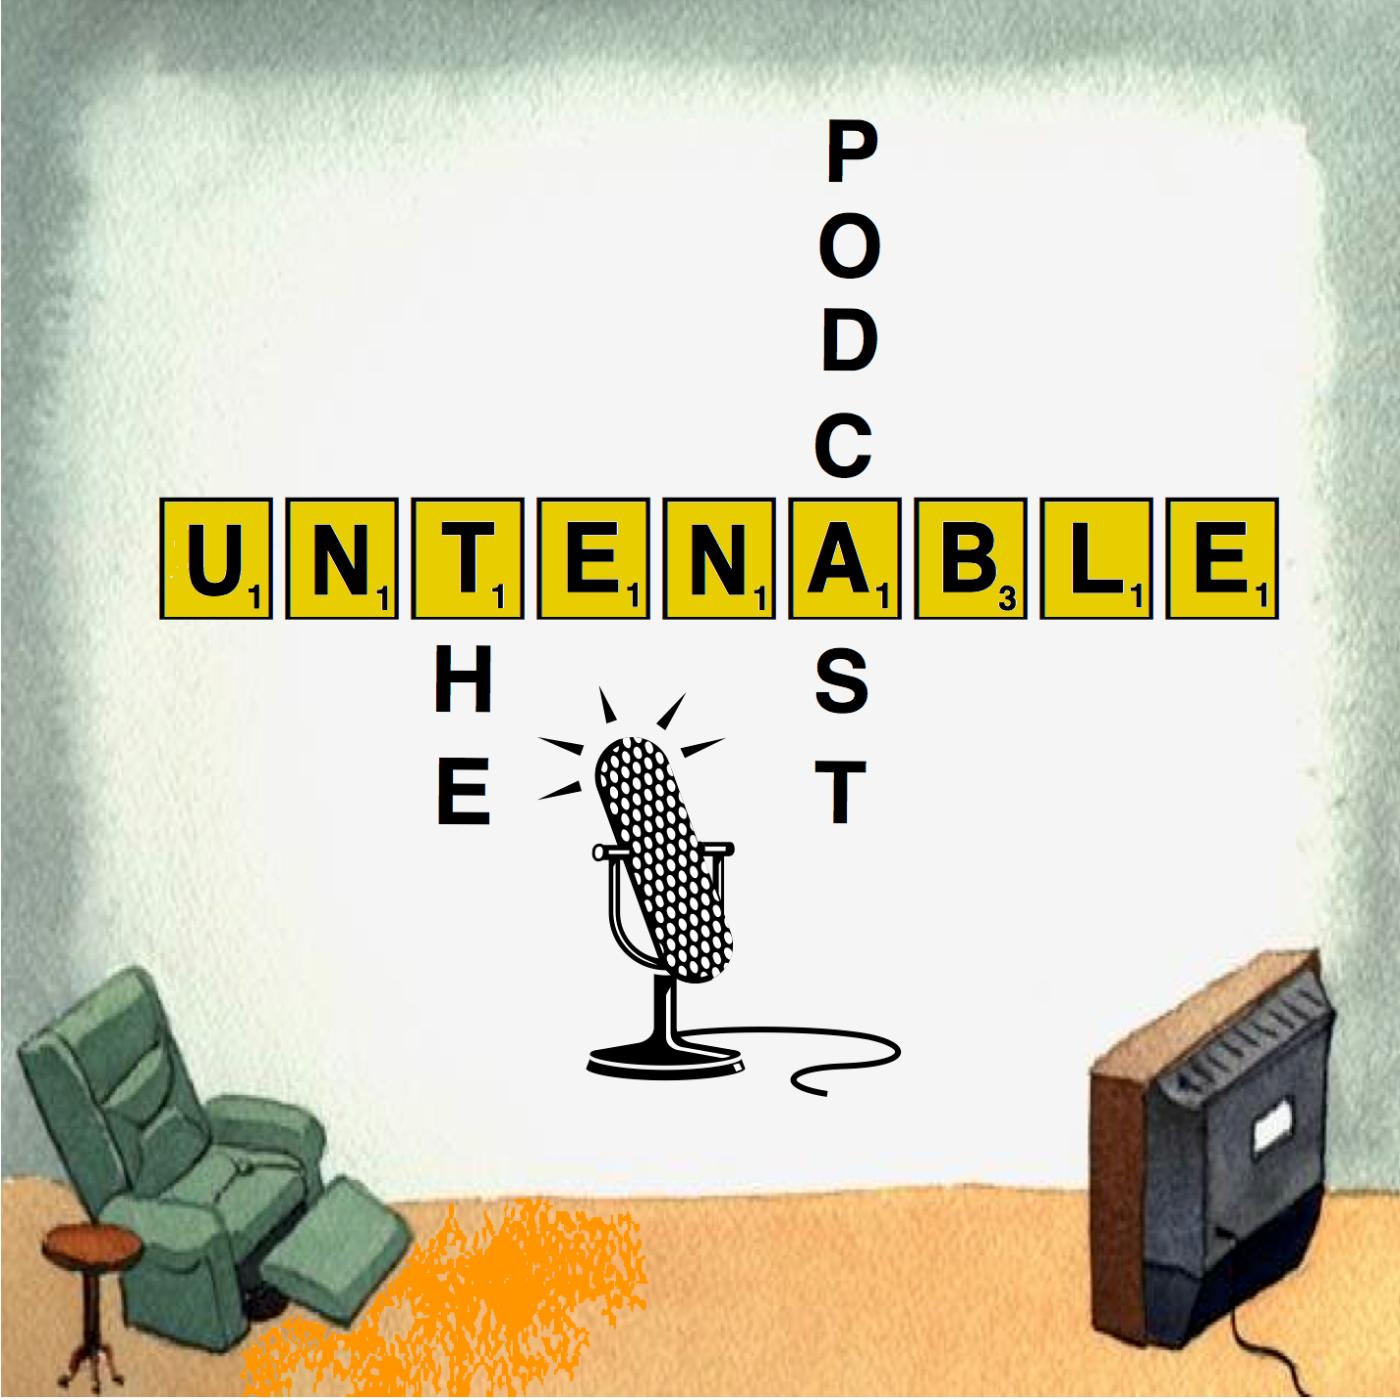 The Untenable Podcast, Episode 60 - Ramble On II: Gettin' to the Ramble